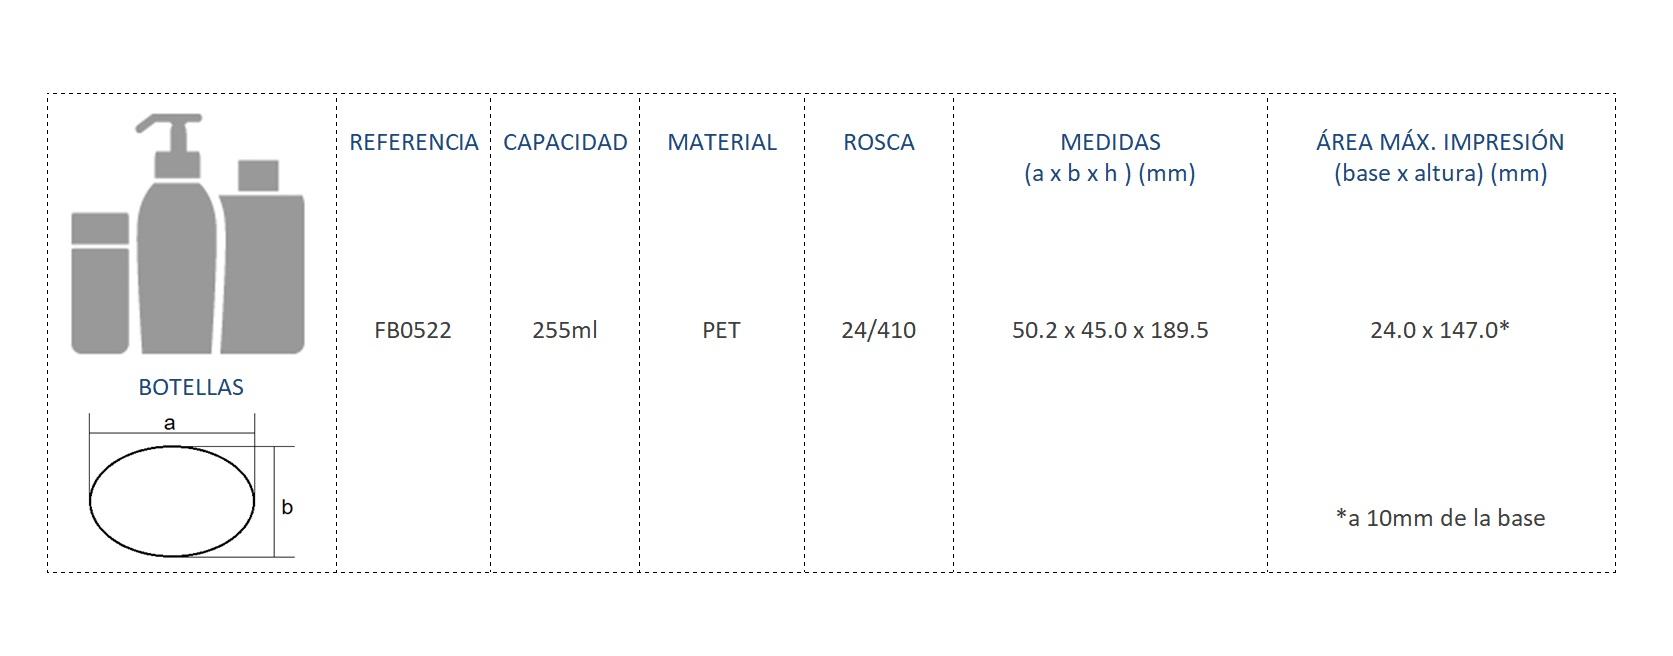 Cuadro de materiales botella FB0522